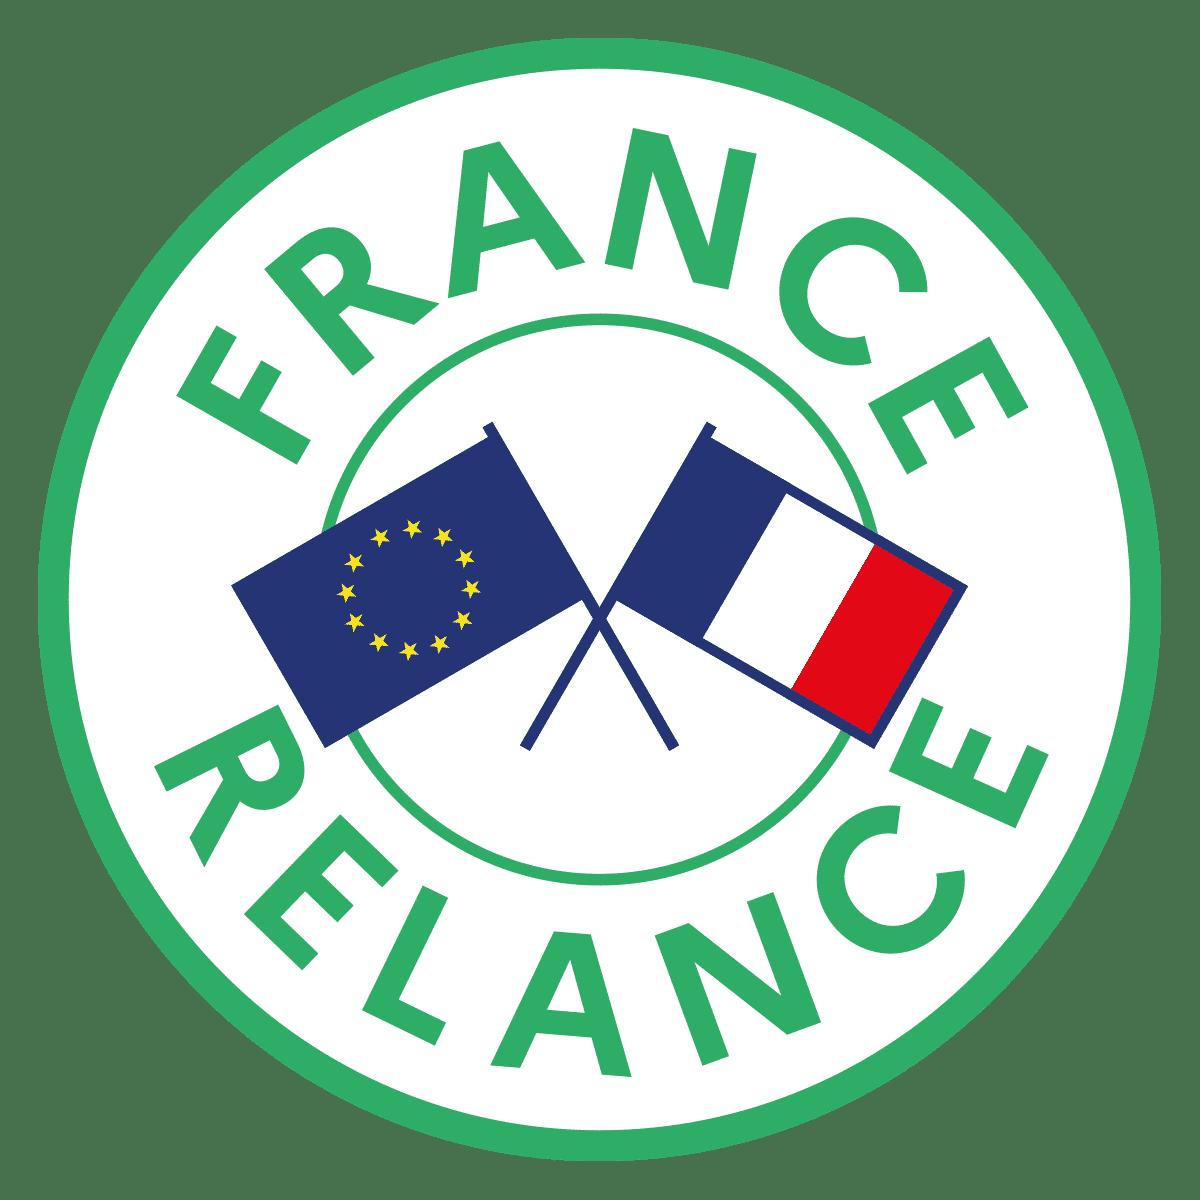 France relance organilog